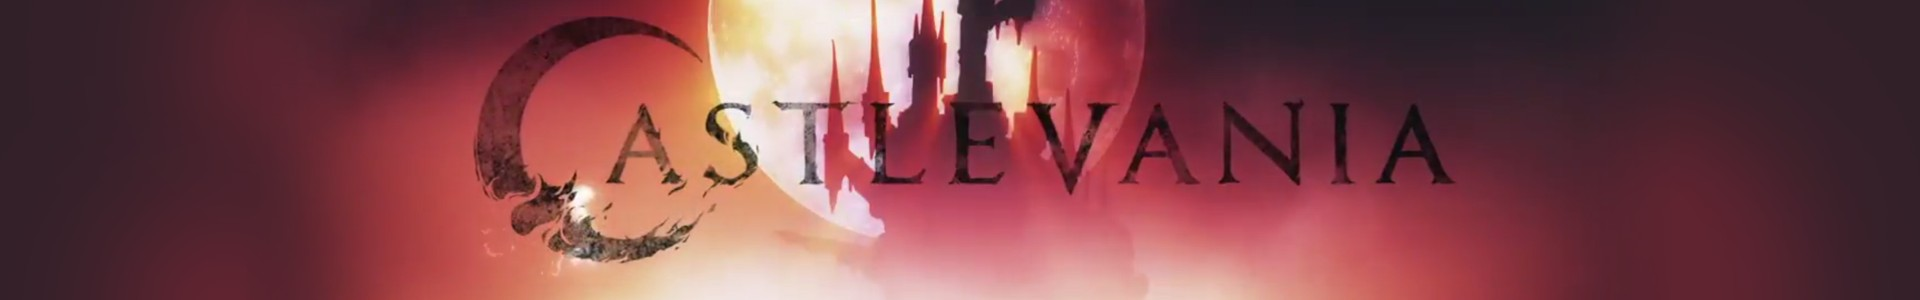 Castlevania: Confira o teaser da série da Netflix inspirada nos games